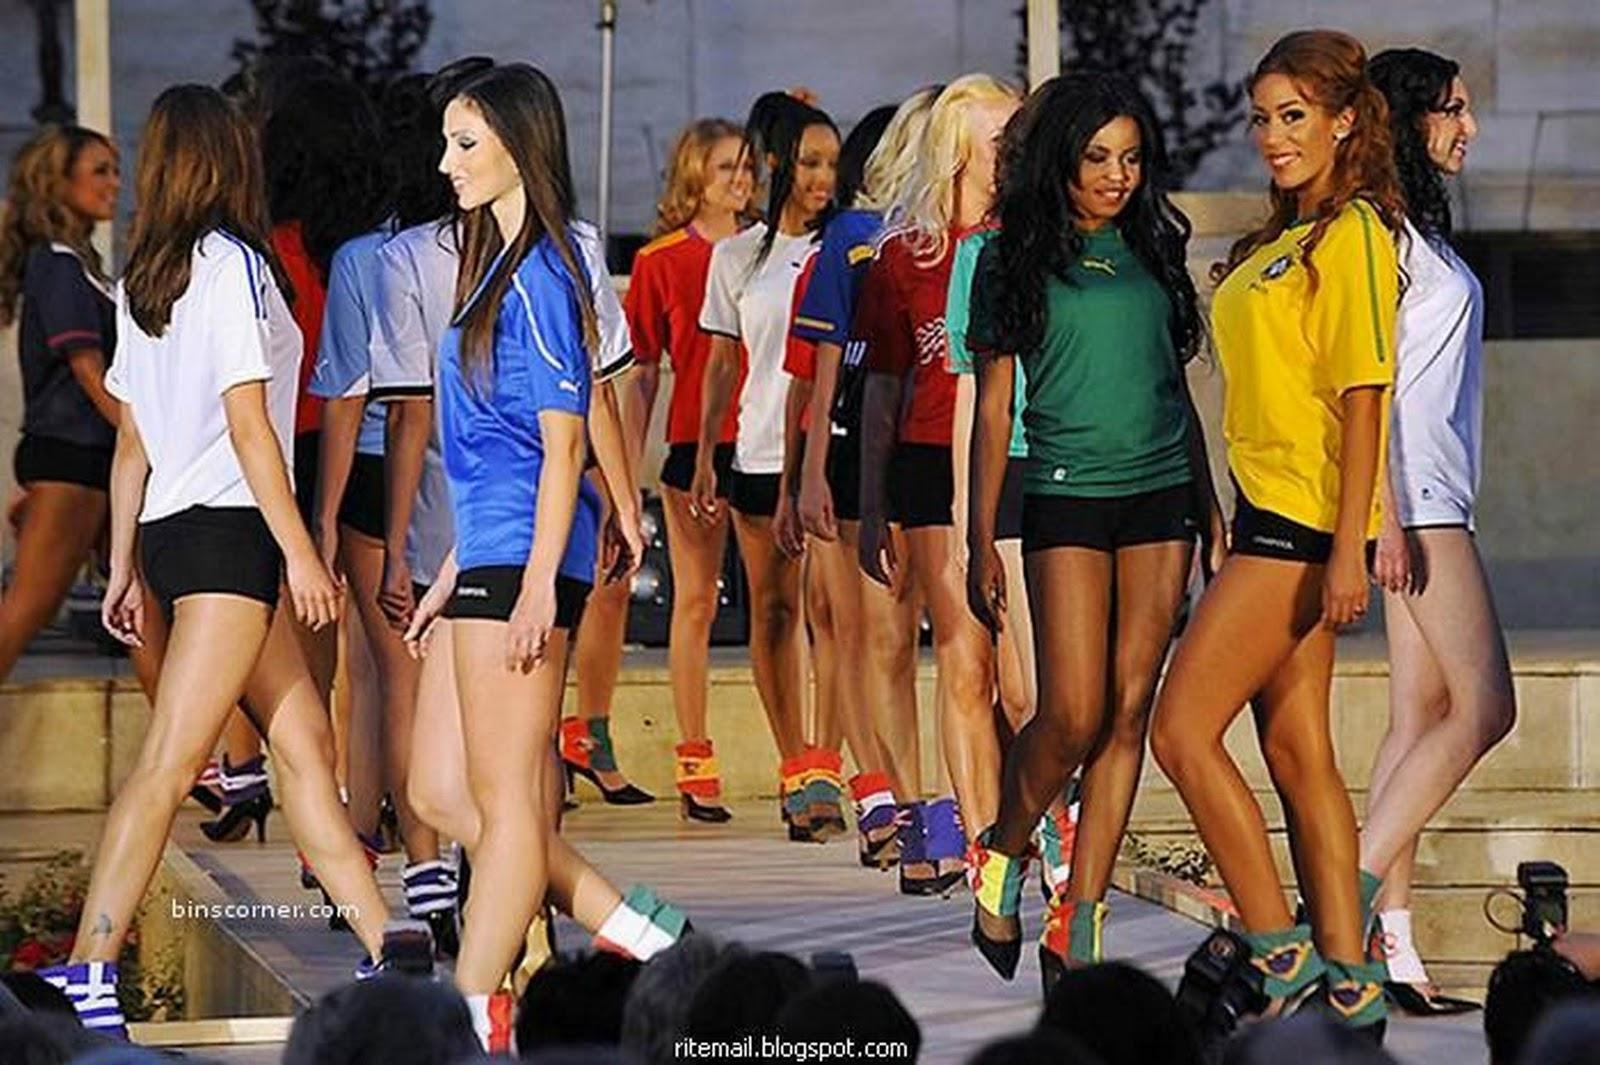 Beautiful Women in Argentina, Beautiful Girl In Argentina, Pretty Girl in Argentina, Love Women, Next Top Model Page, Beautiful Women In The World